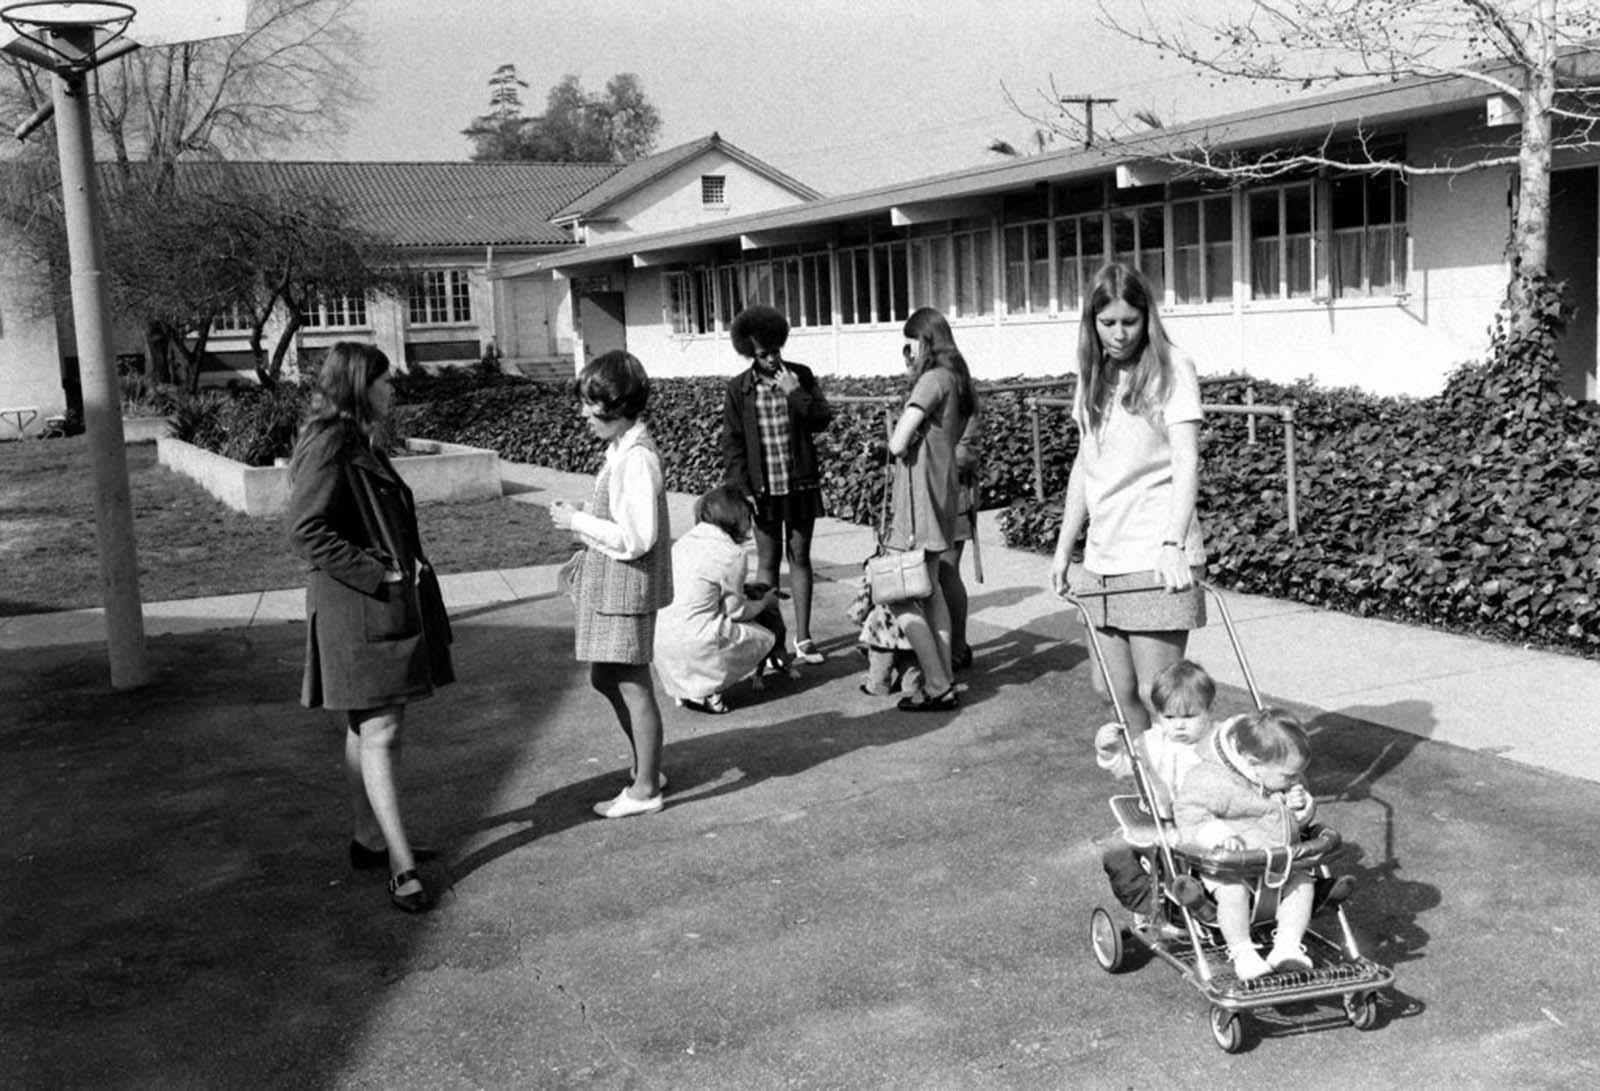 teen_pregnancy_1970s (6).jpg